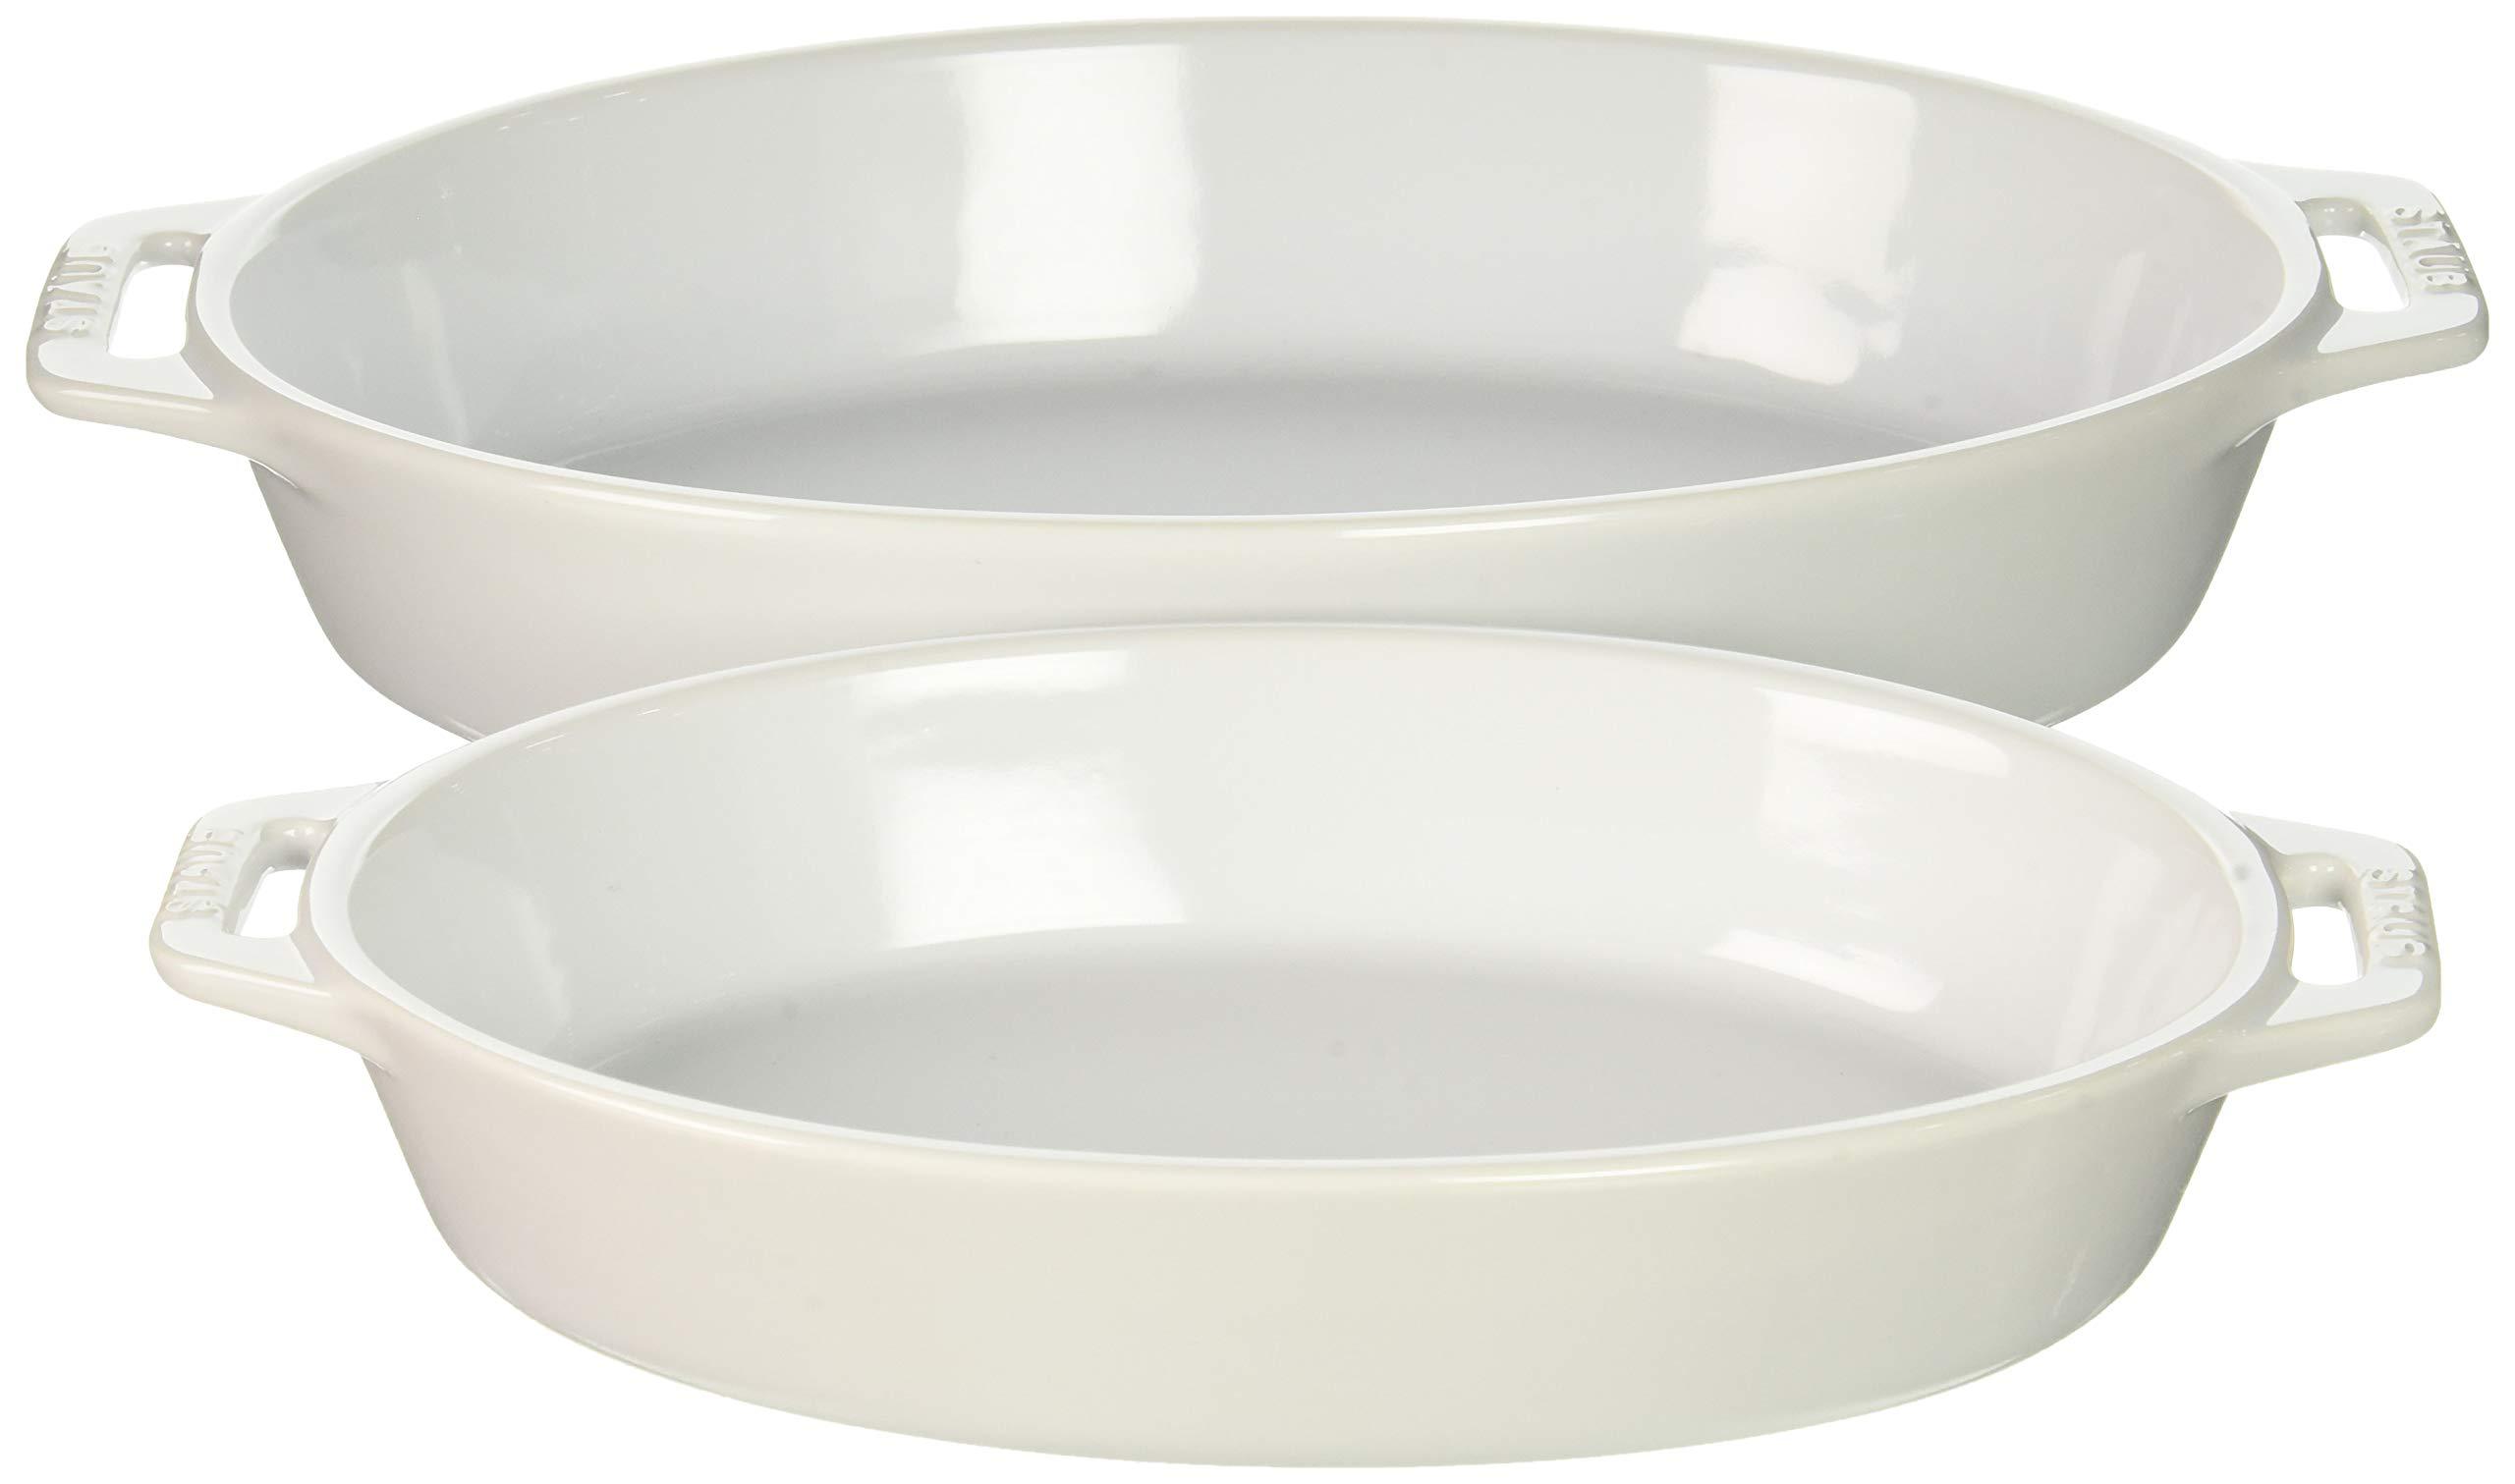 Staub 40508-633 Ceramics Oval Baking Dish Set, 2-piece, White